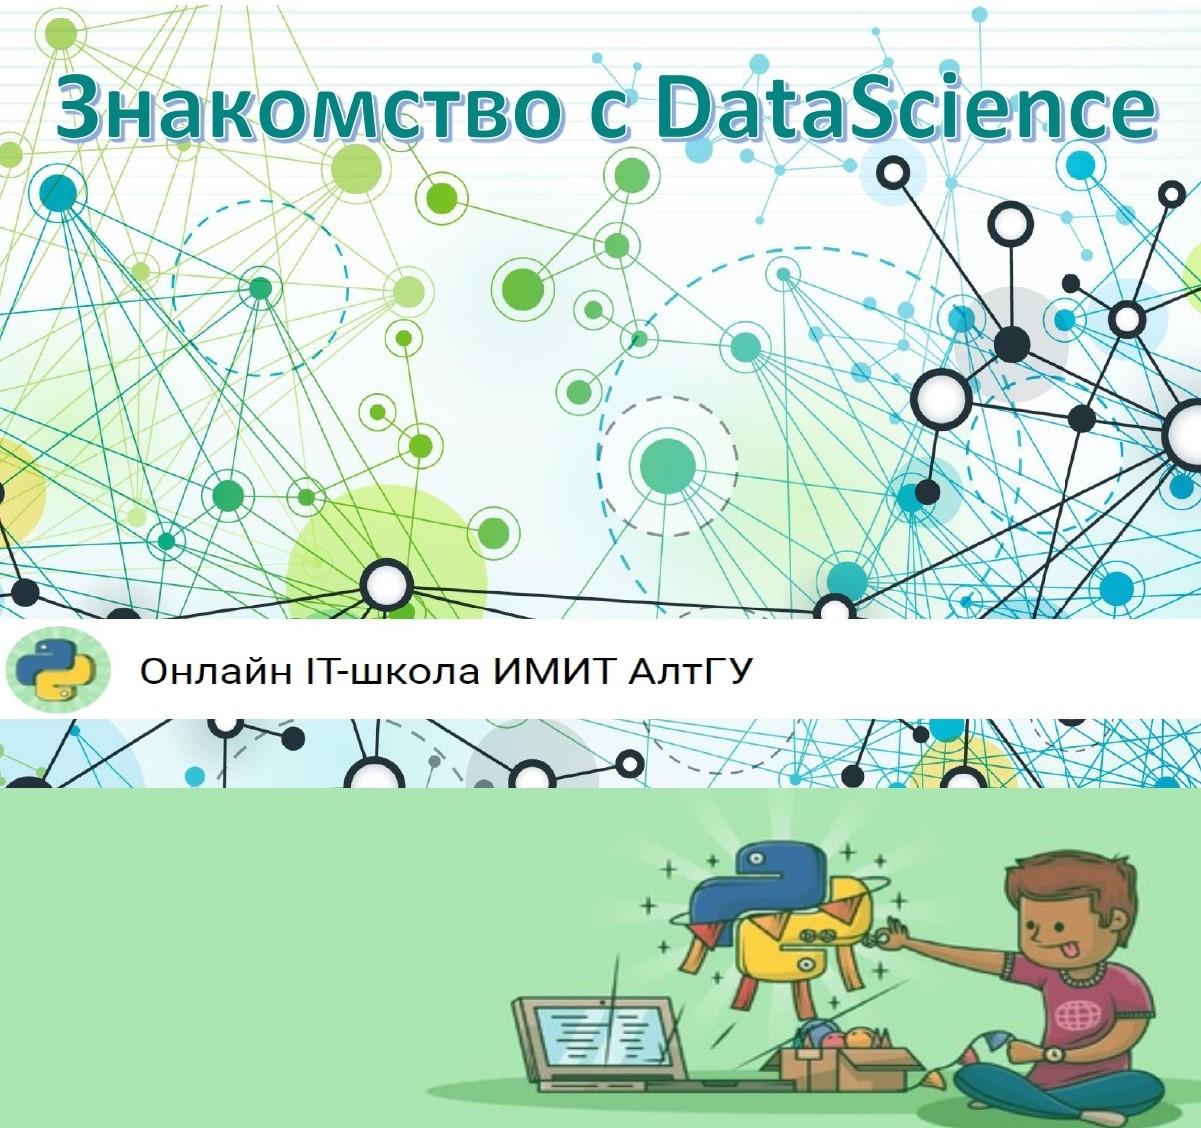 Весенняя IT-школа ИМИТ «Знакомство с DataScience»